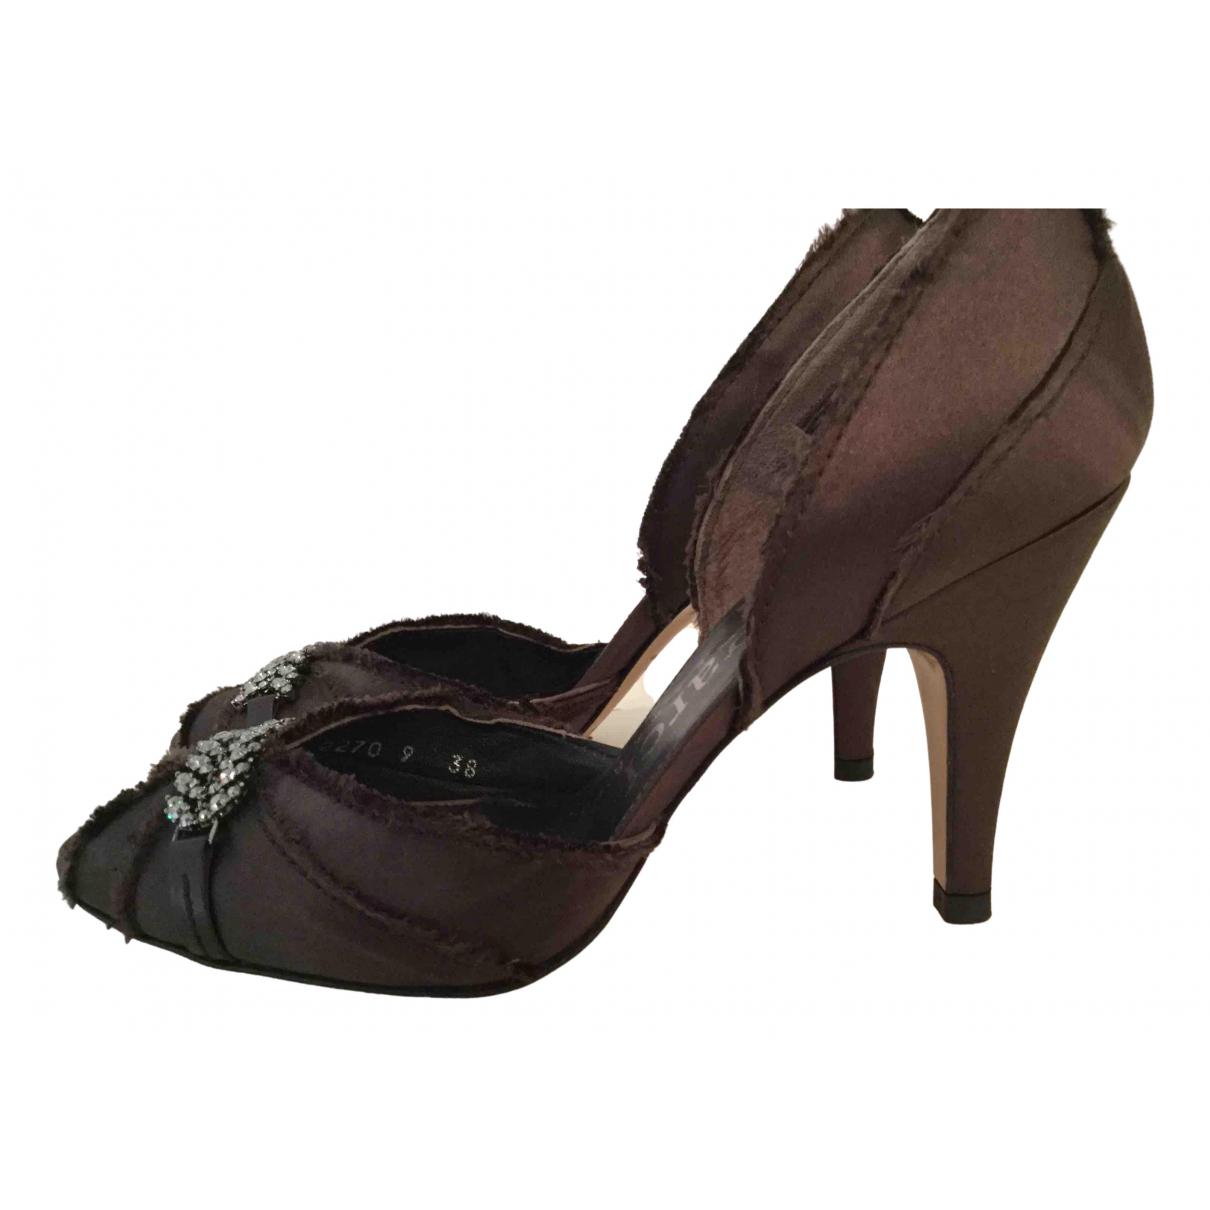 Pedro Garcia N Brown Cloth Heels for Women 38 EU